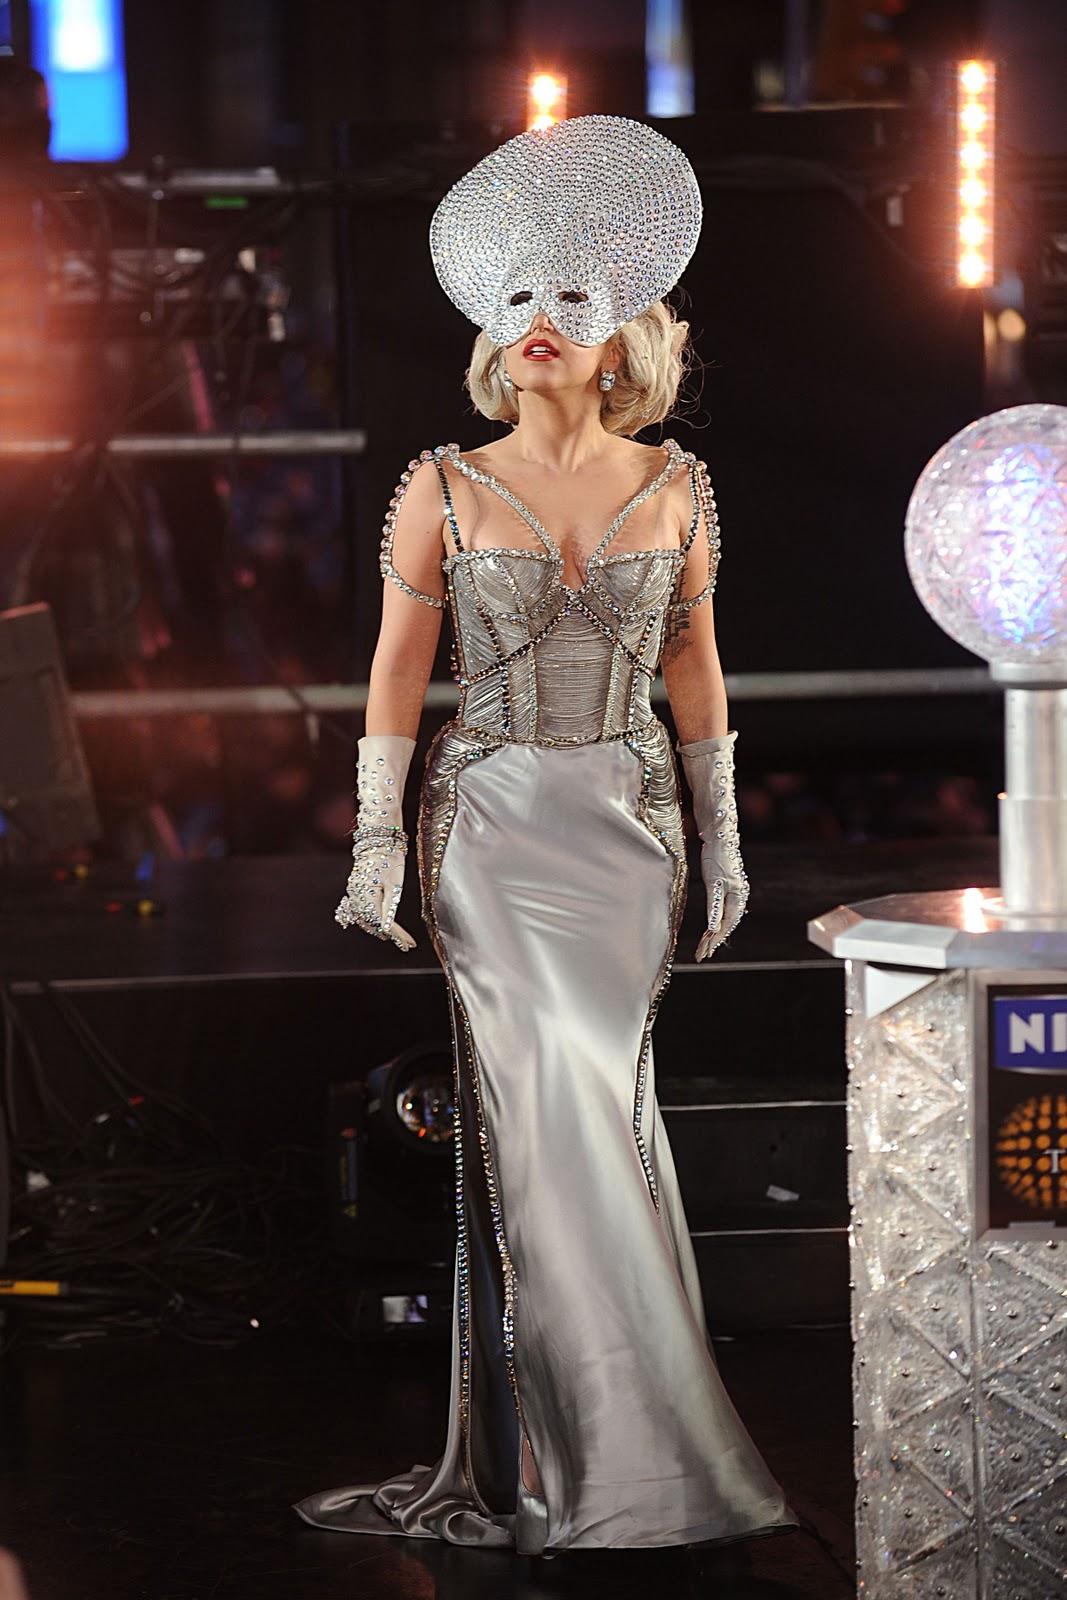 http://1.bp.blogspot.com/-2zn8228y3v8/Twm1a_EwjQI/AAAAAAAAOM8/LPXb3_kUXxo/s1600/08837_Lady_Gaga_DickClarksNewYearsRockinEve_J0001_027_122_855lo.jpg